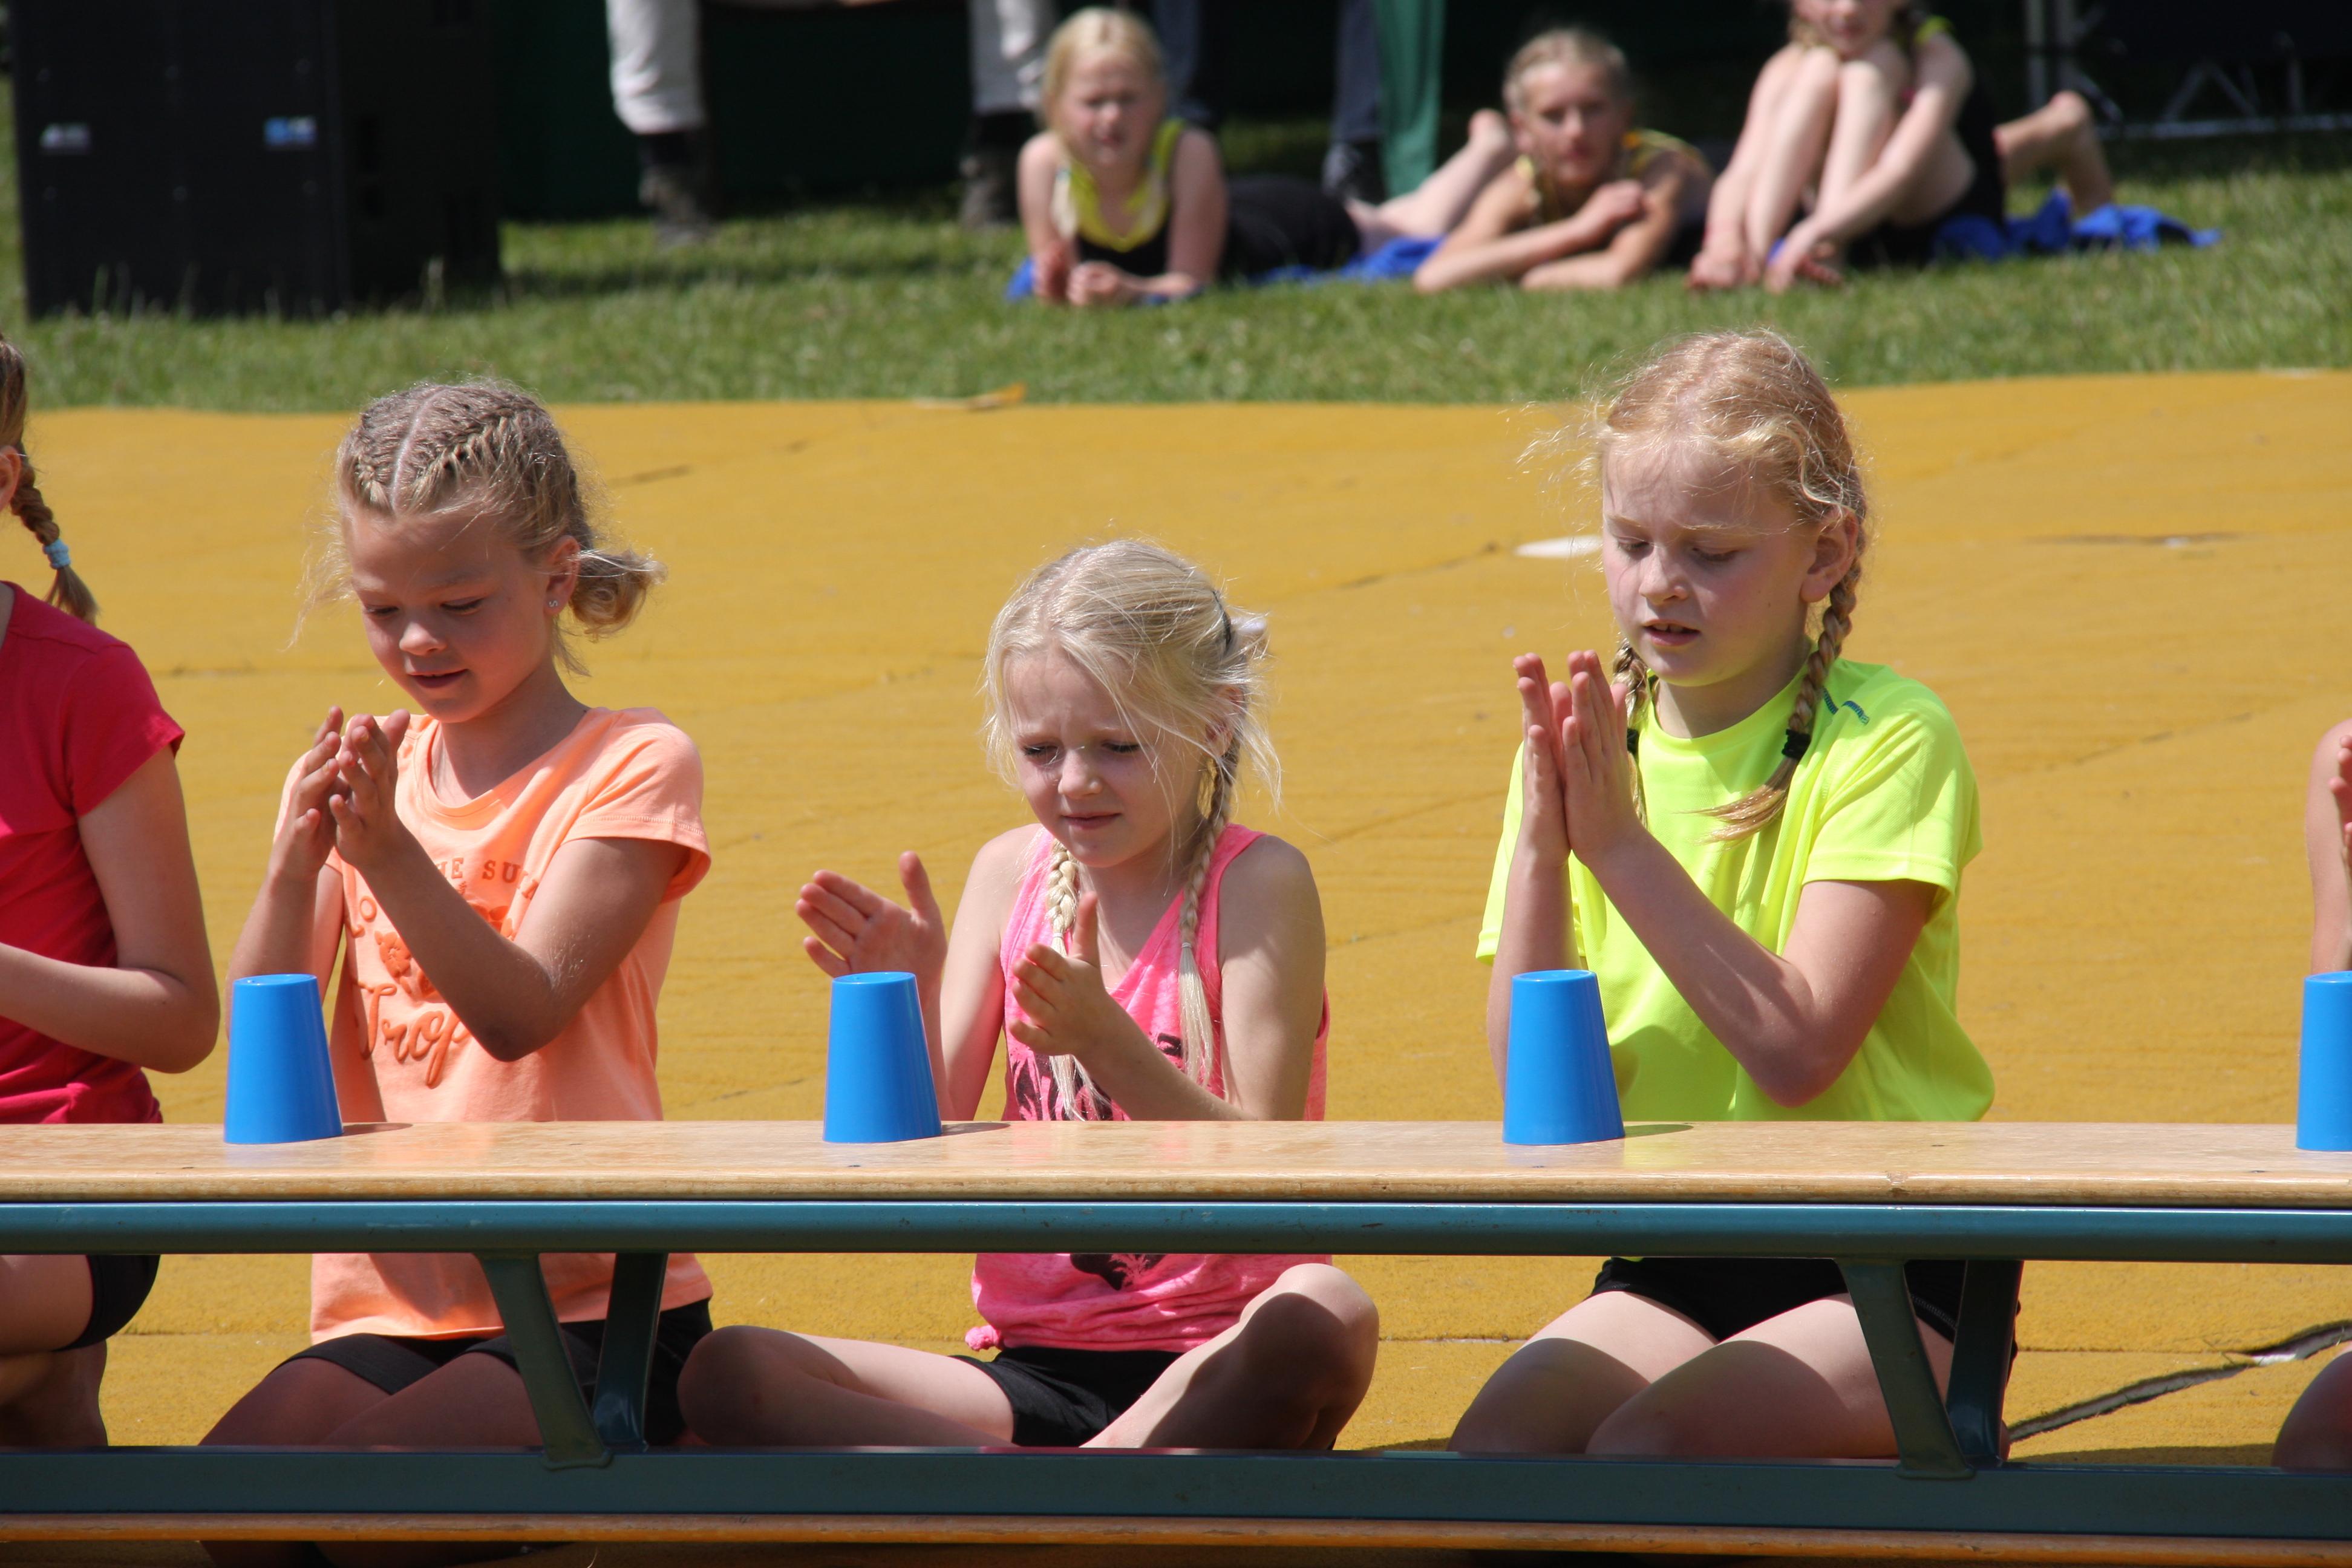 gymnastiekuitvoering-juni-2015-010